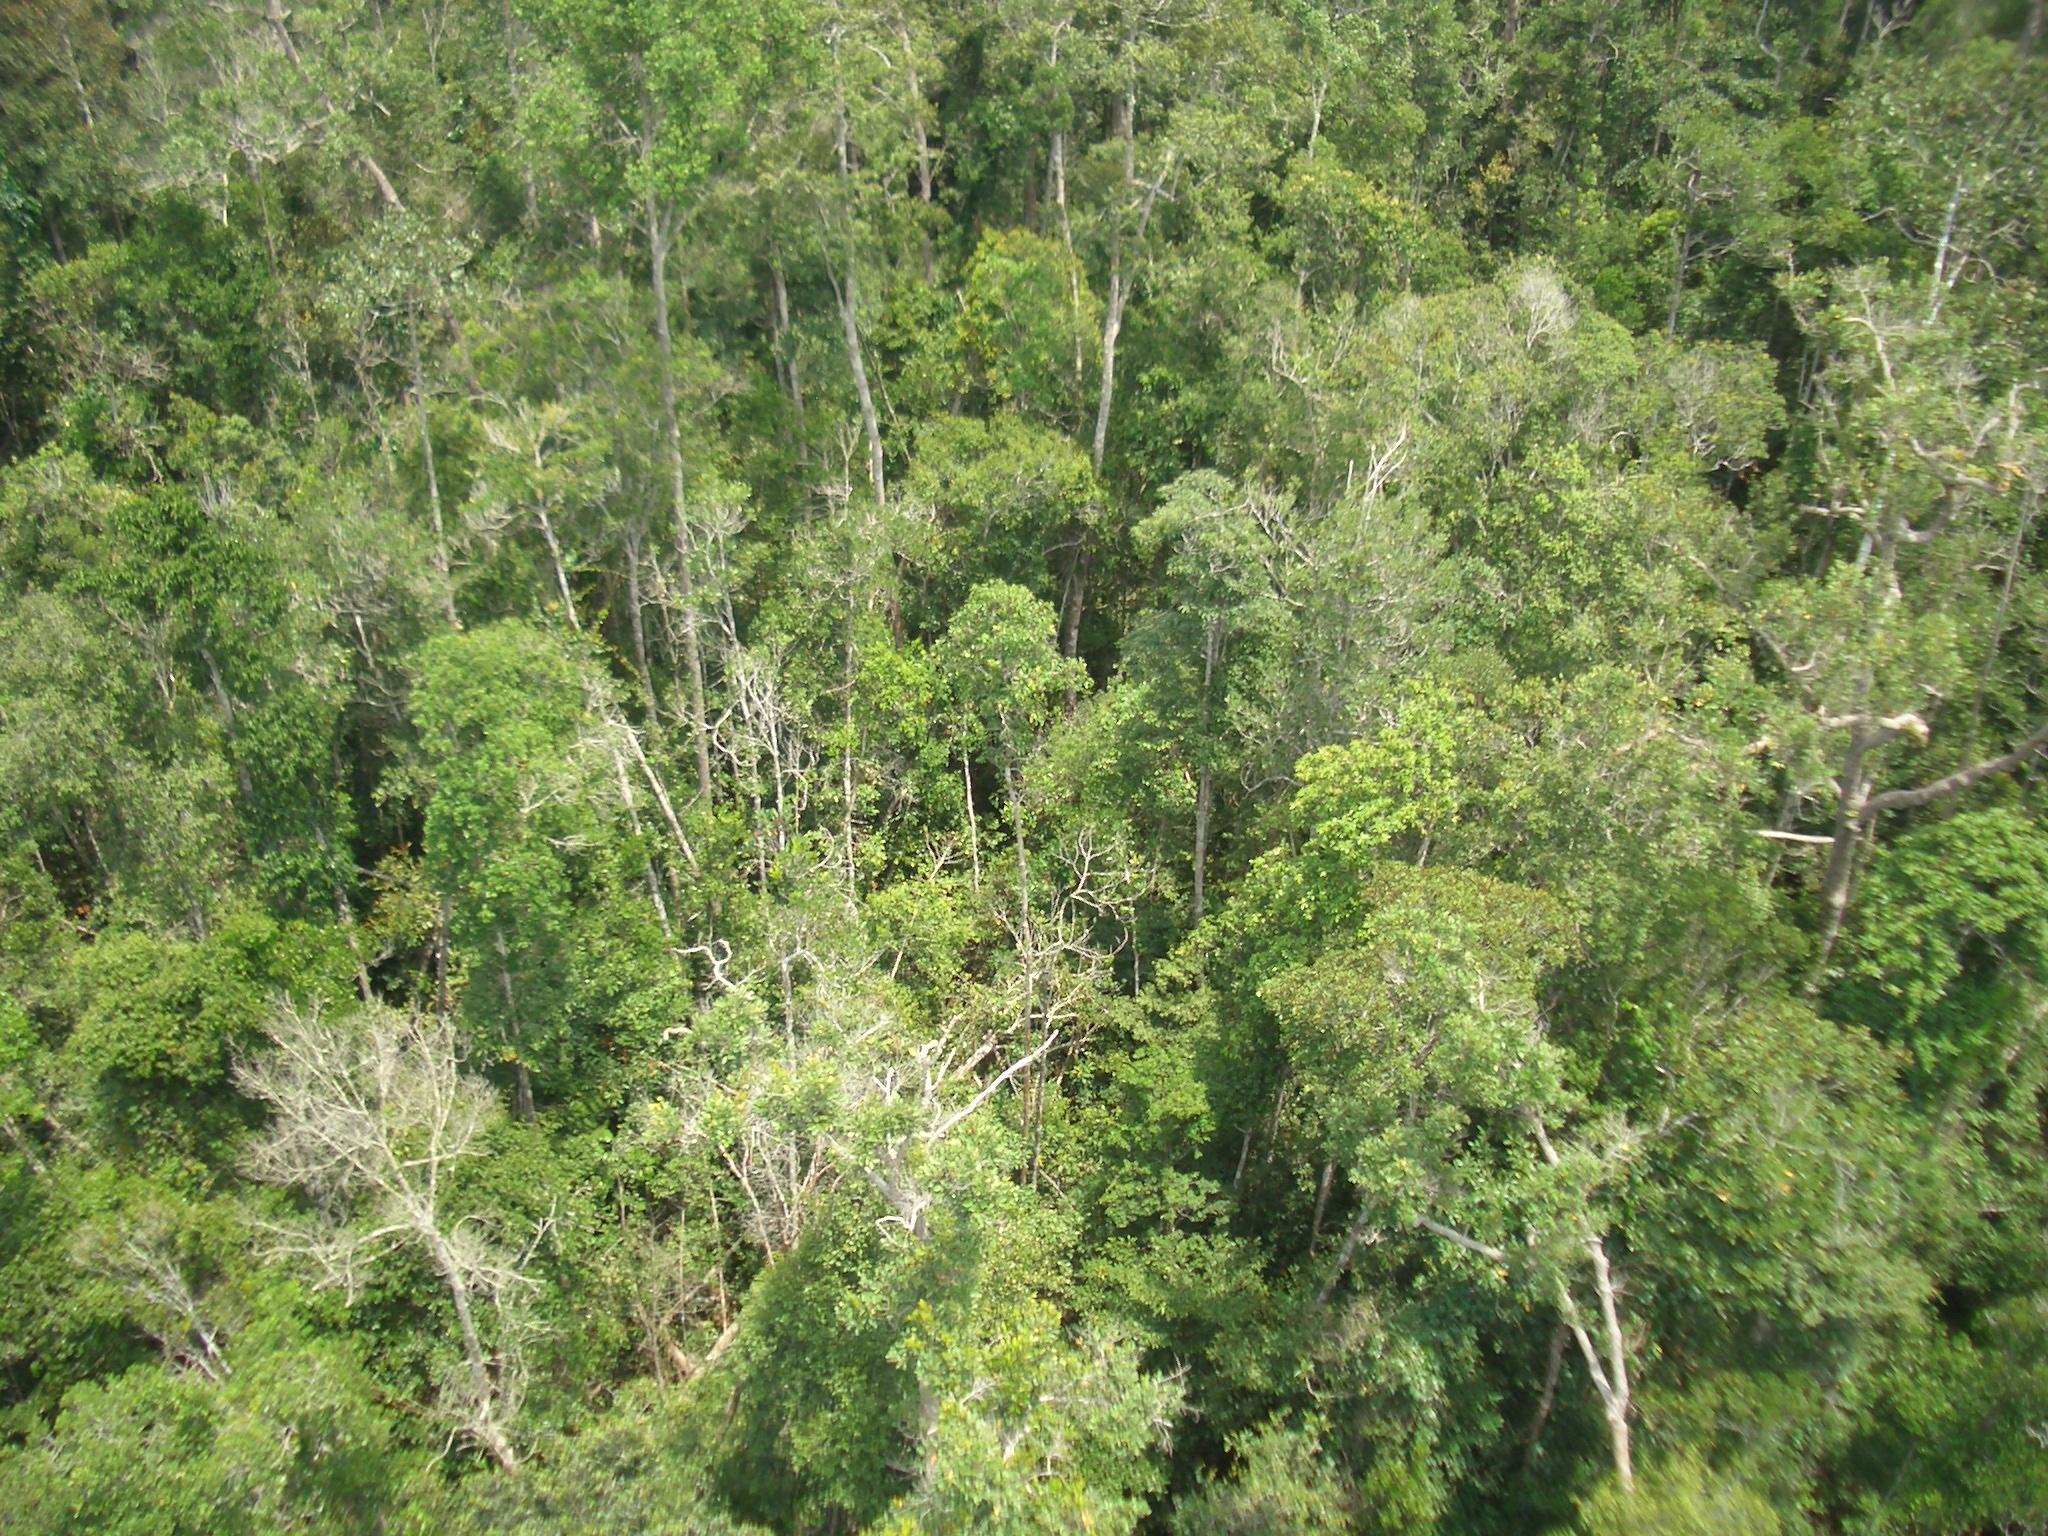 2007-09-20-57-kalimantan-foresta.jpg